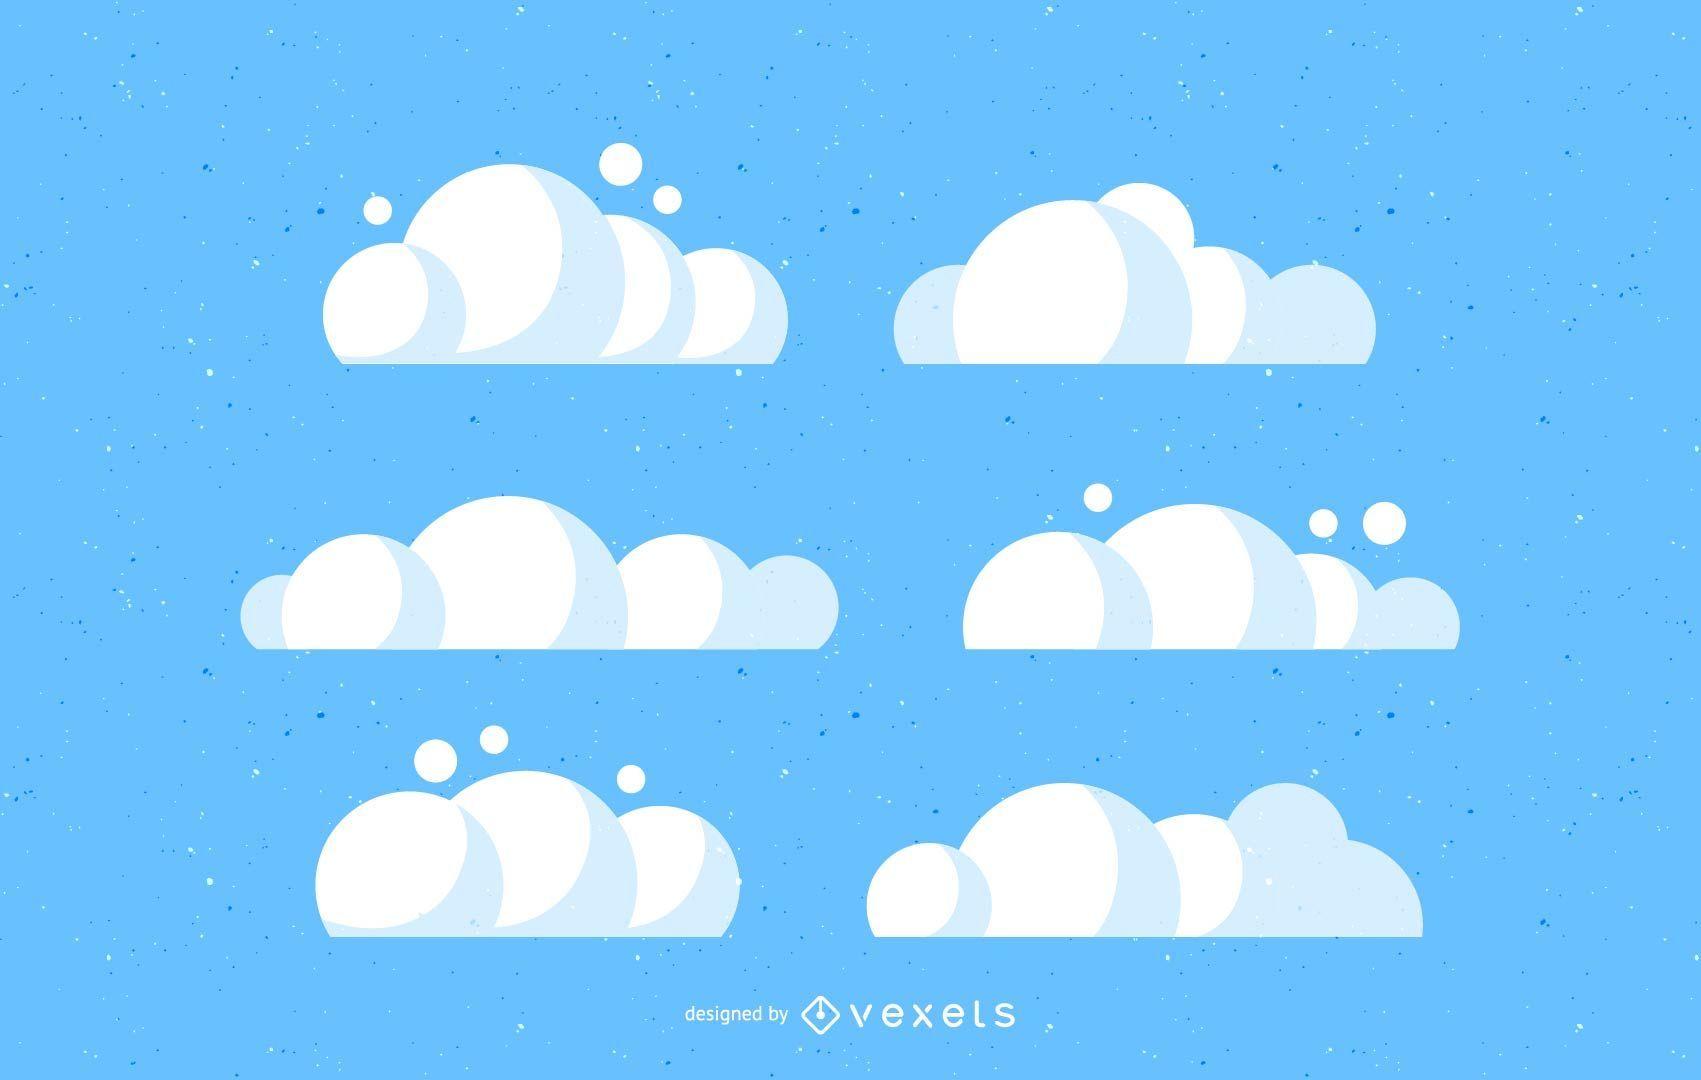 Clouds illustrations set - Vector download